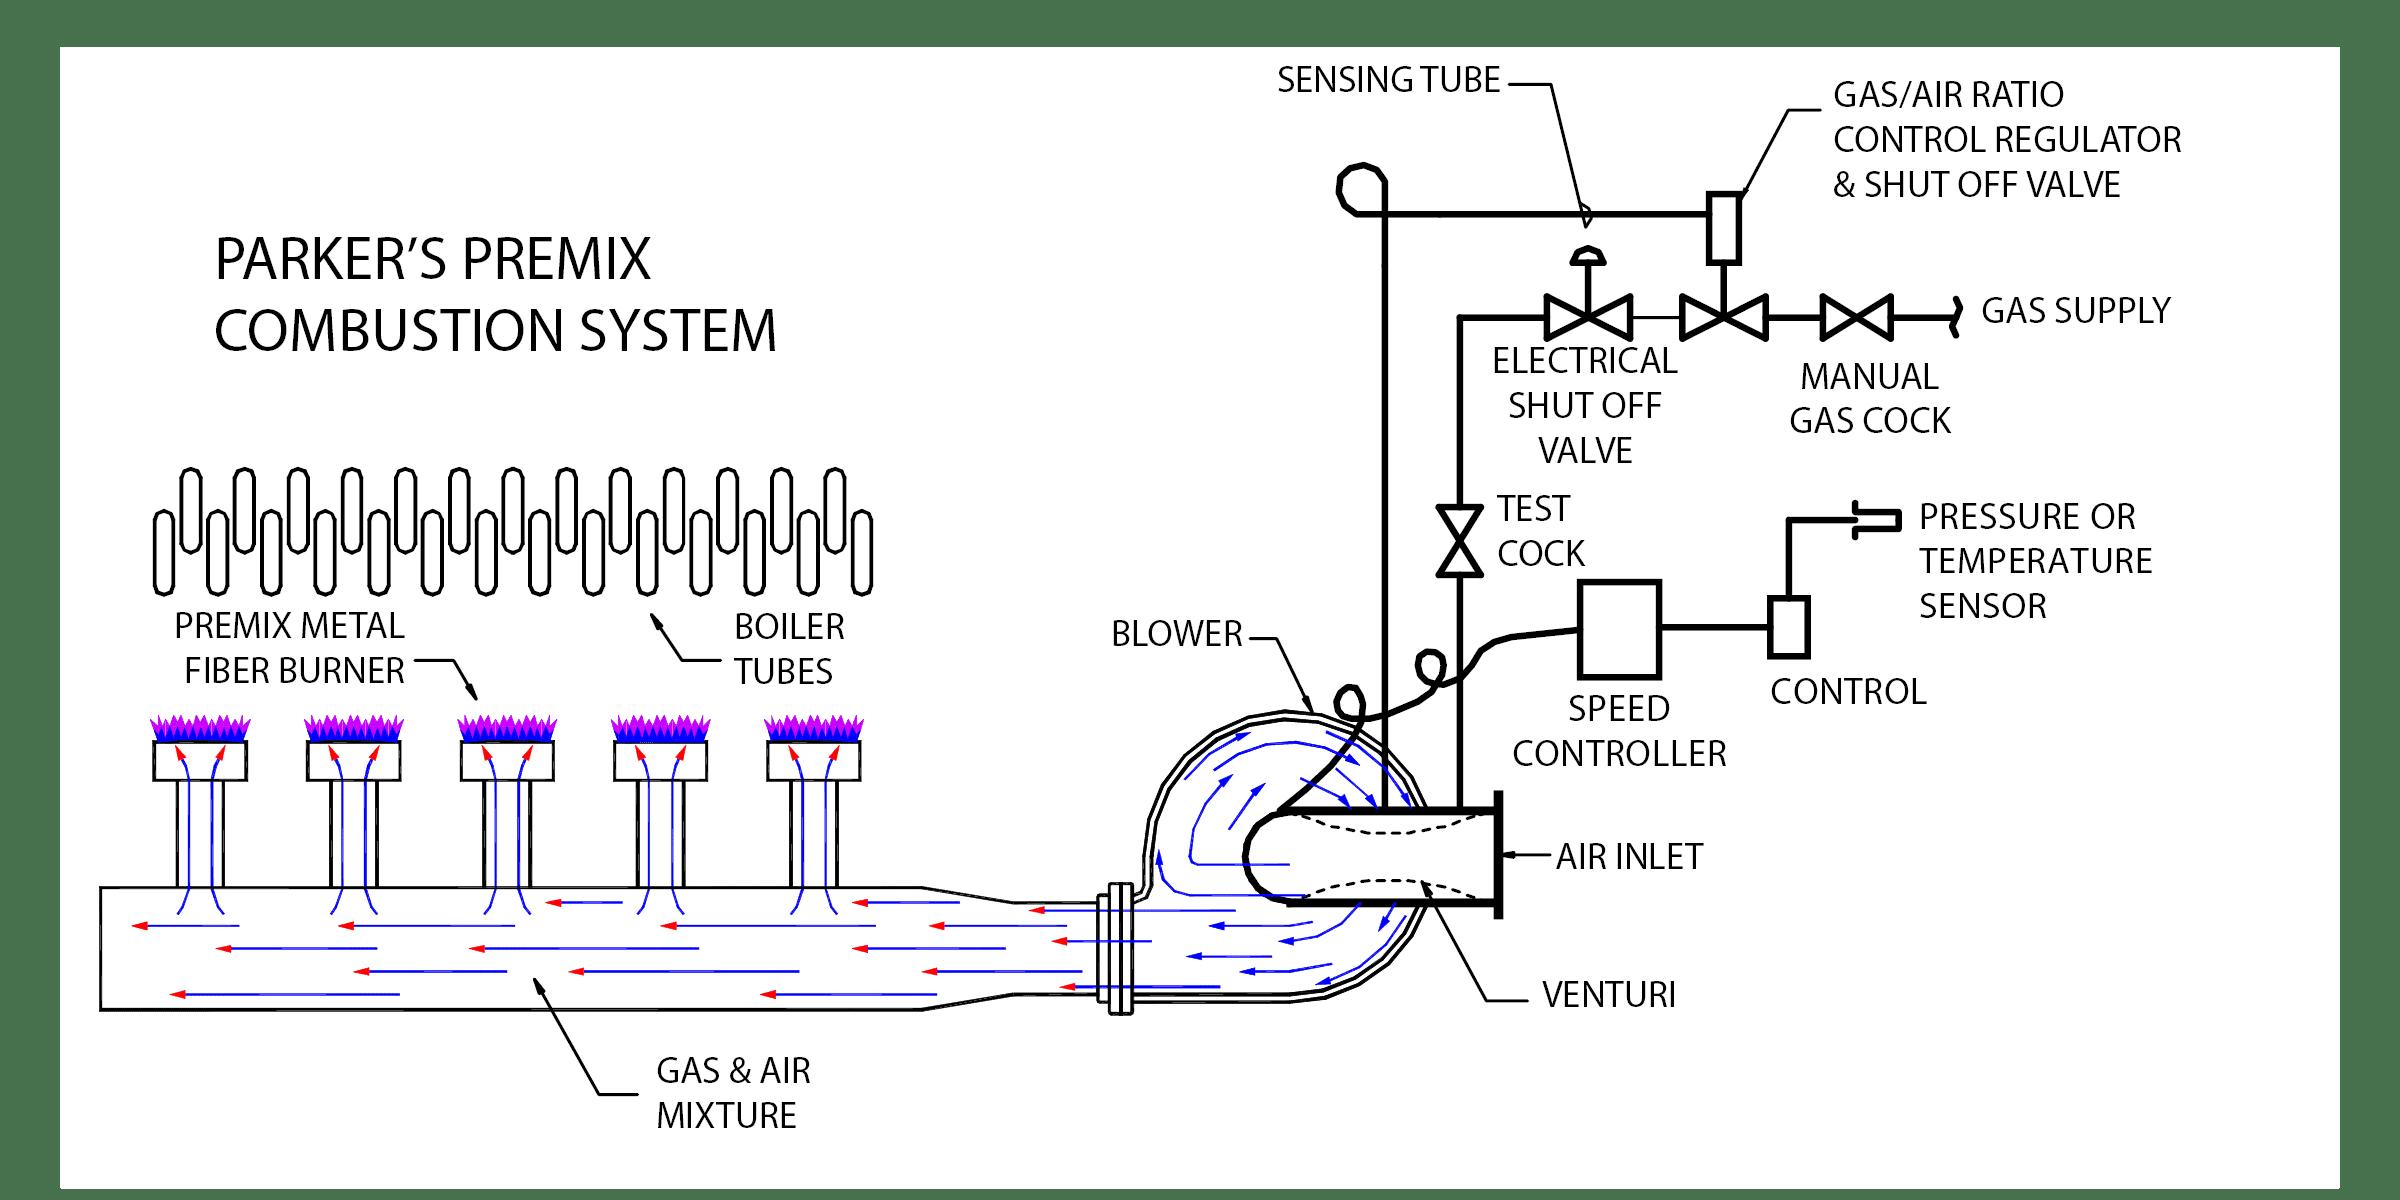 parker ez draw schematics diagram diy enthusiasts wiring diagrams u2022 rh broadwaycomputers us parker fly wiring diagram parker fly wiring diagram